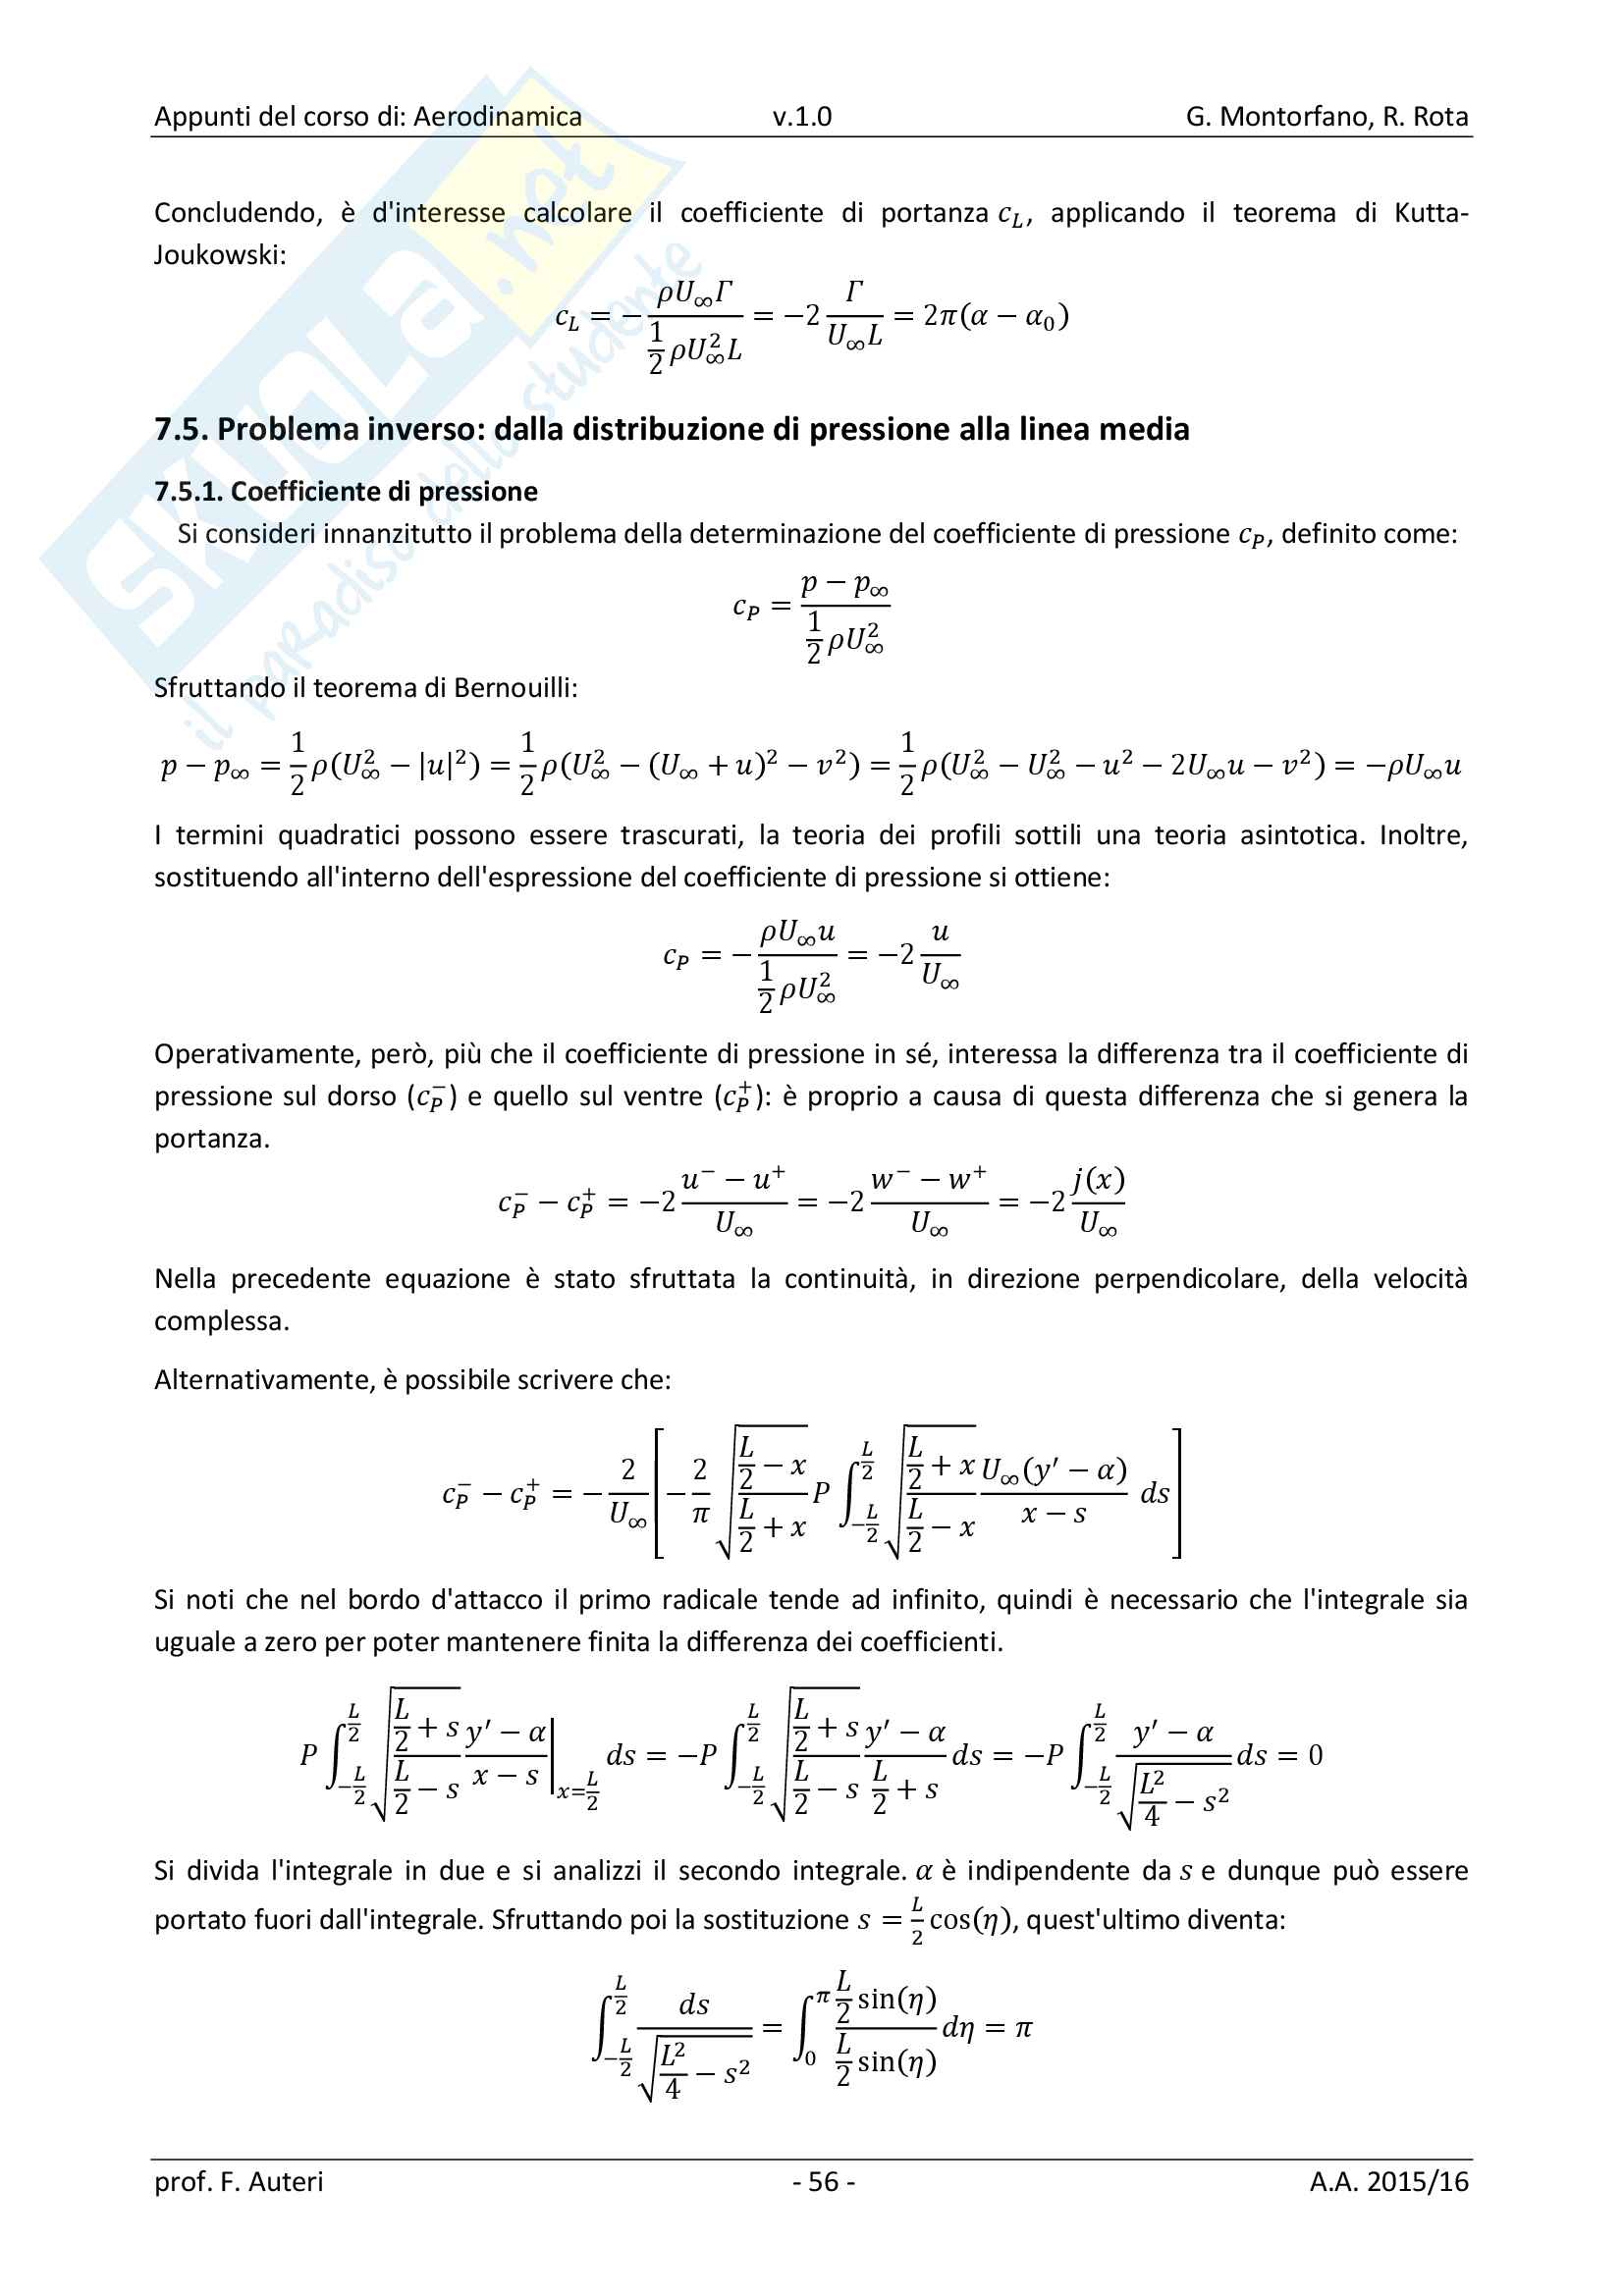 Appunti di Aerodinamica Pag. 66